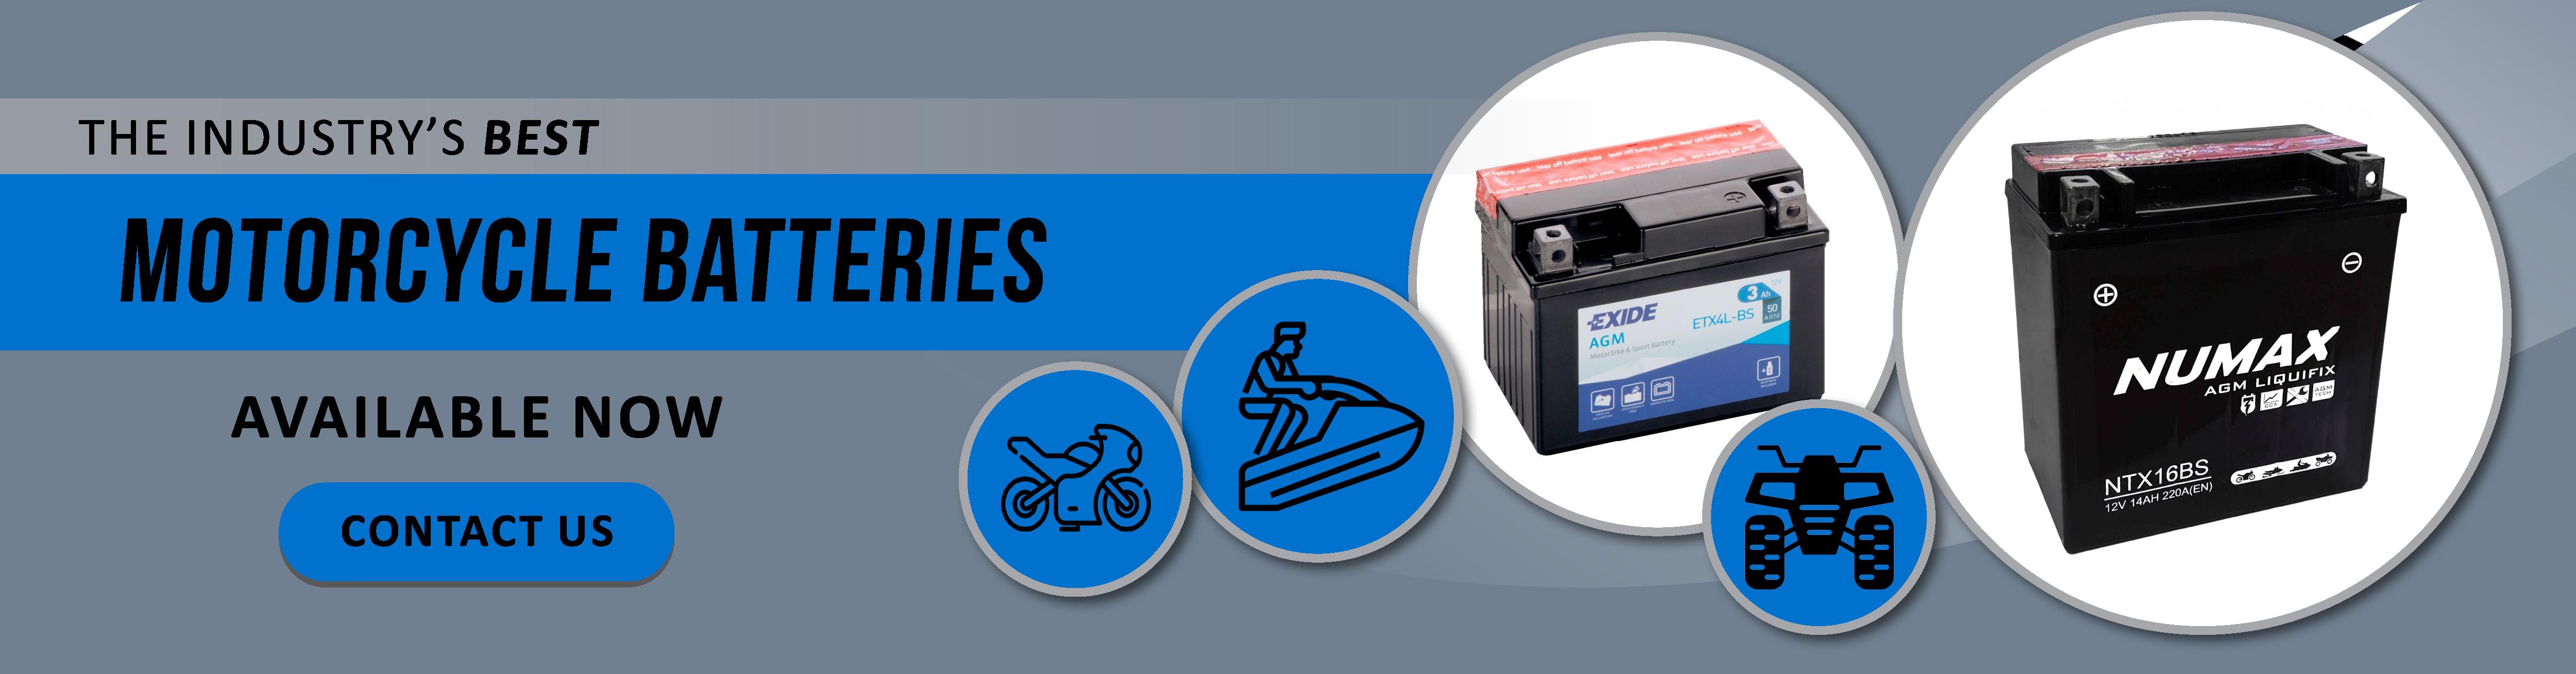 Motorycle-batteries-banner